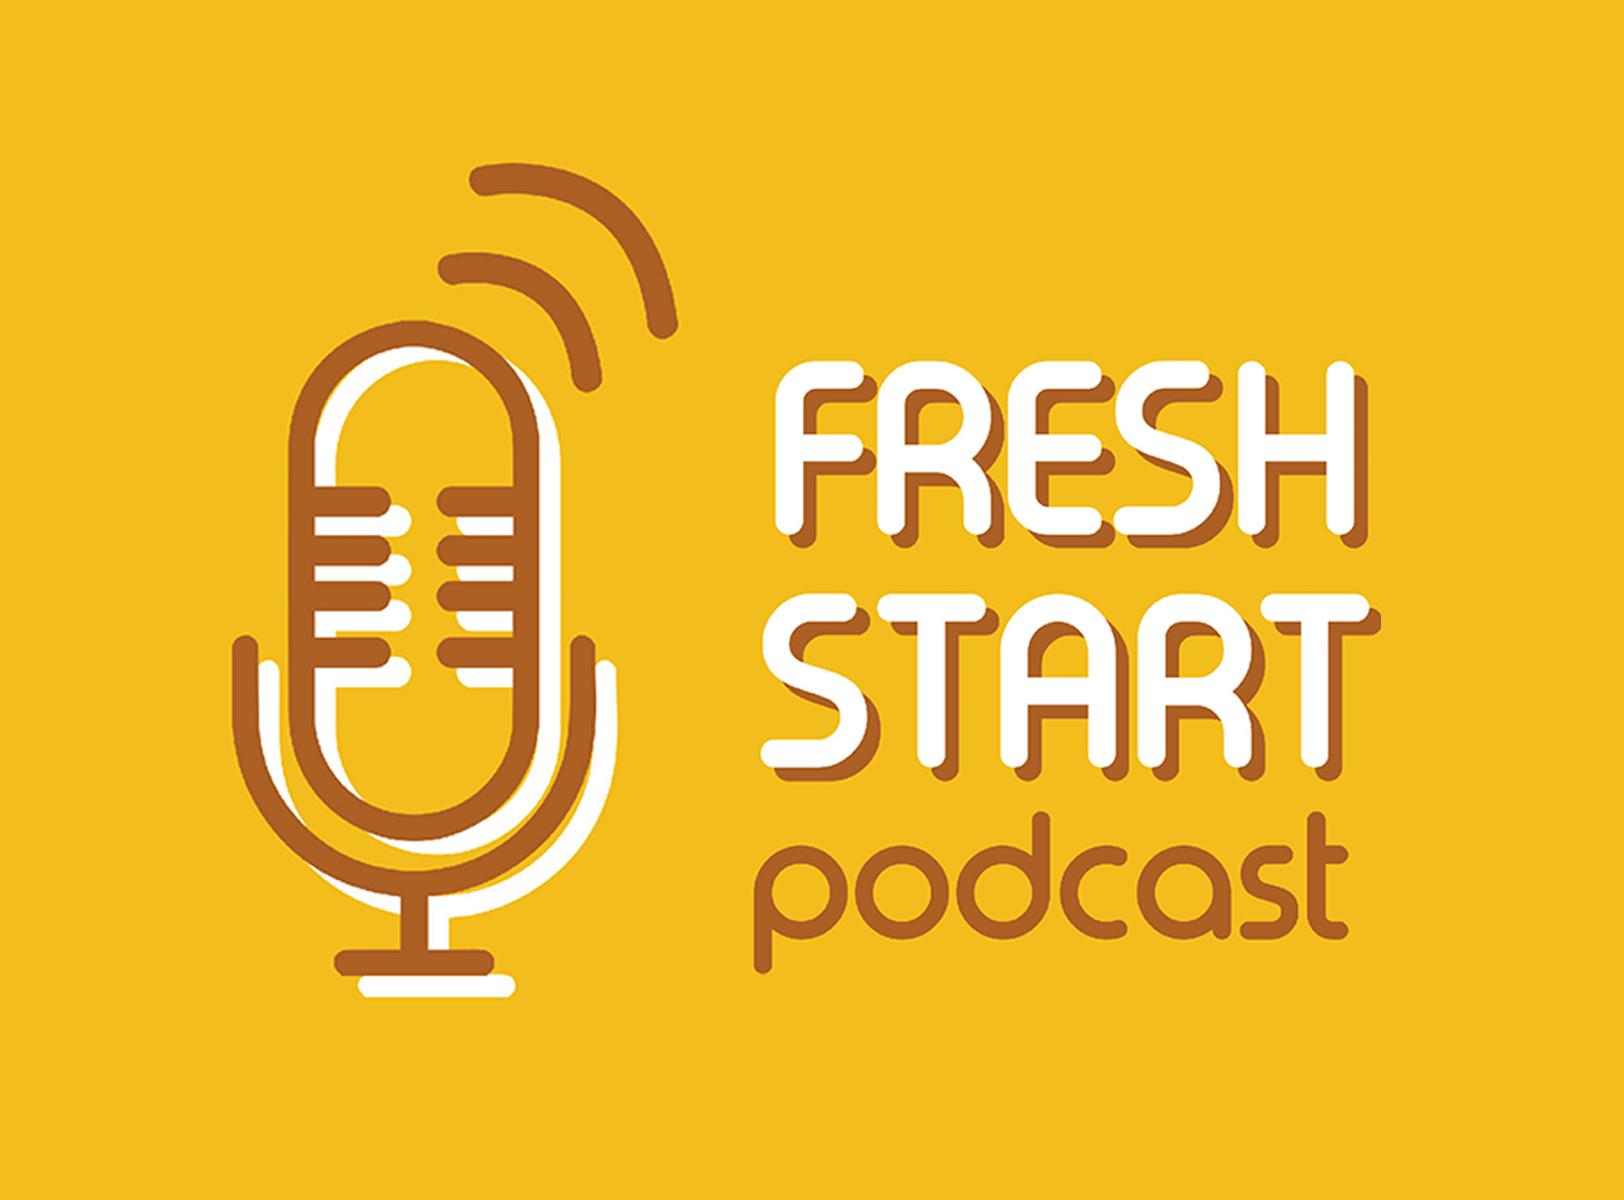 Fresh Start: Podcast News (11/28/2018 Wed.)